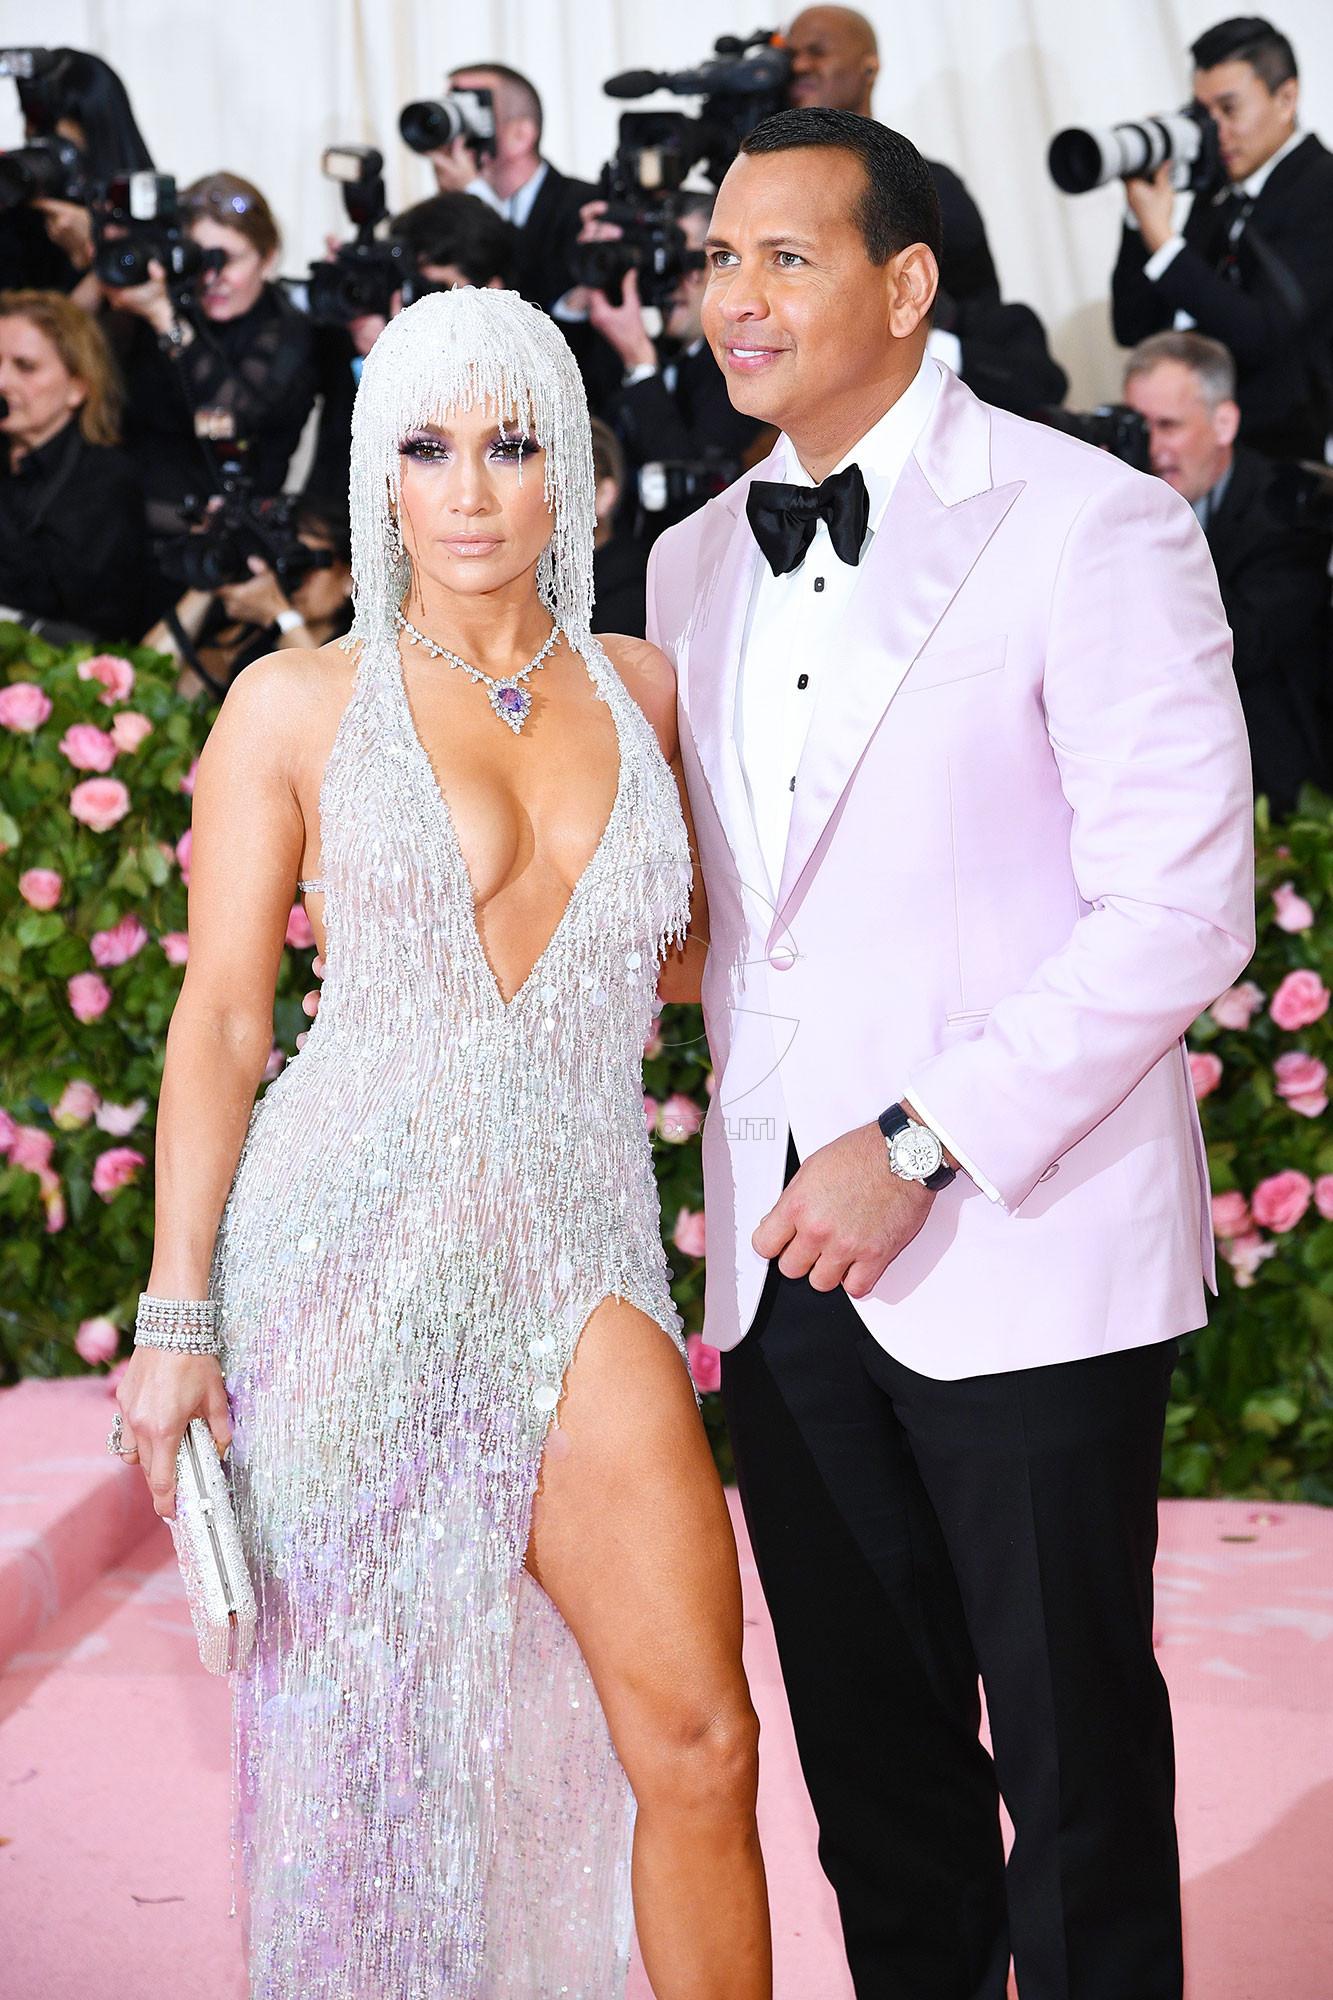 Alex-Rodriguez-and-Jennifer-Lopez-Instagram-Met-Gala-2019.jpg-05